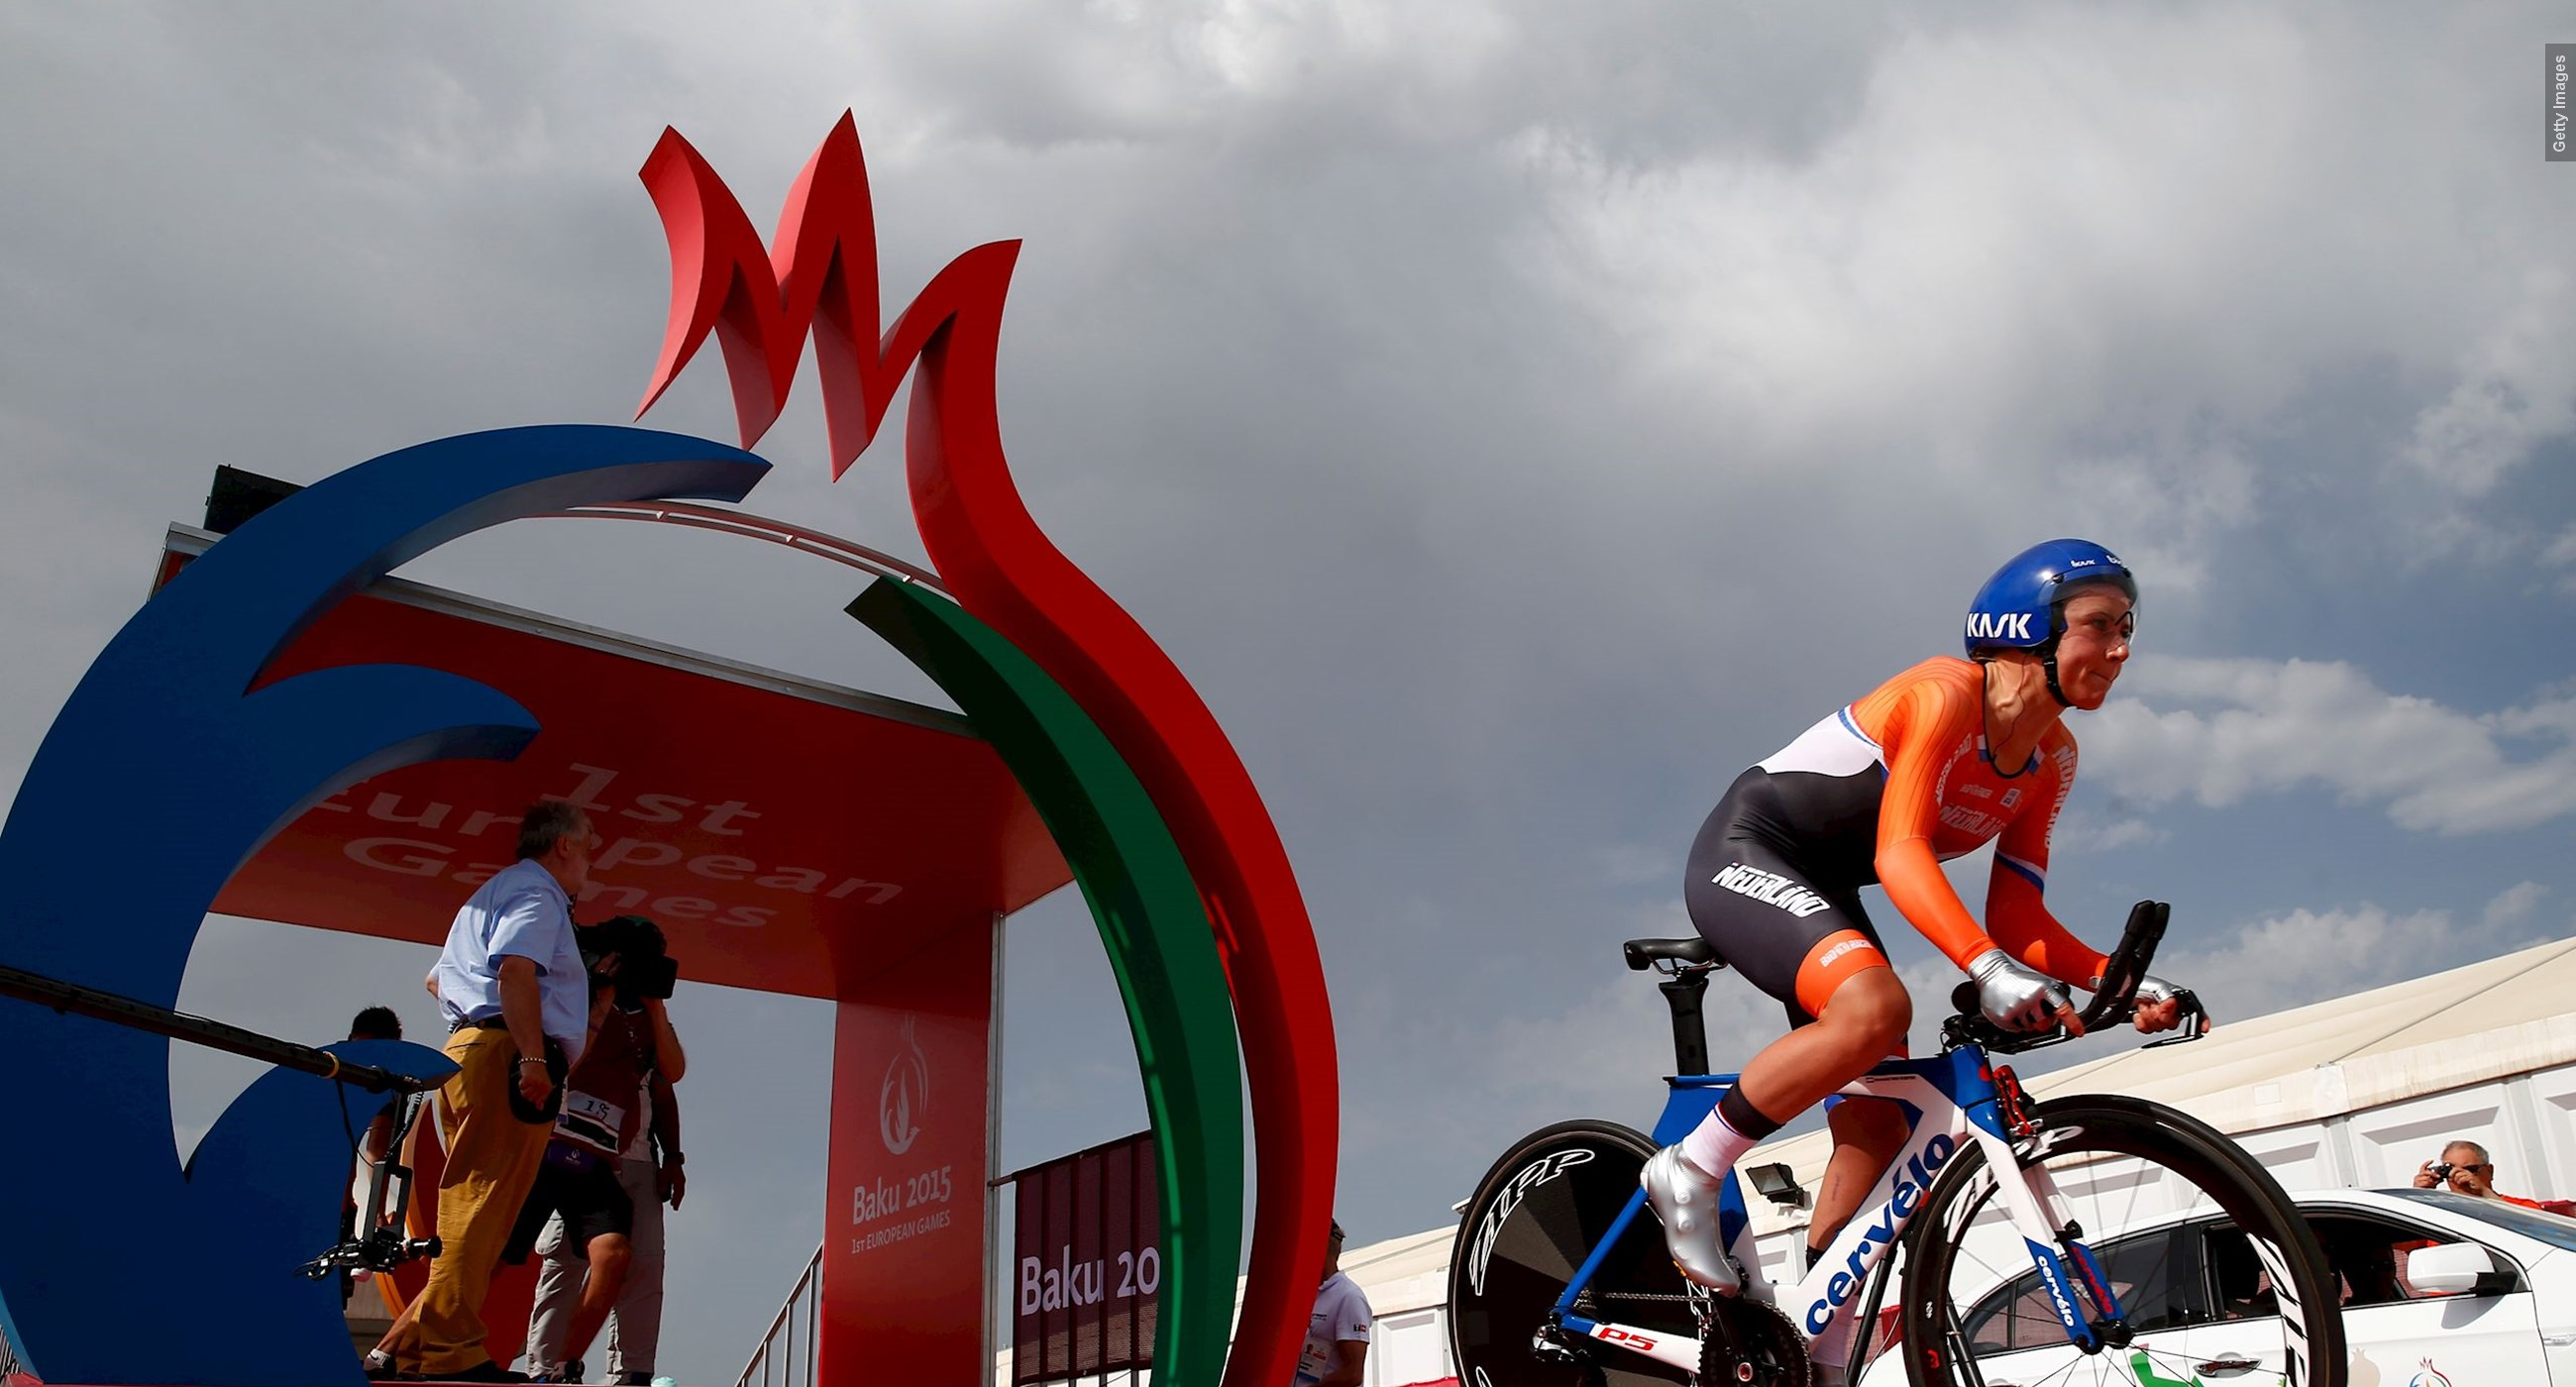 World Tour wielrennen (v): OVO Energy Women's Tour